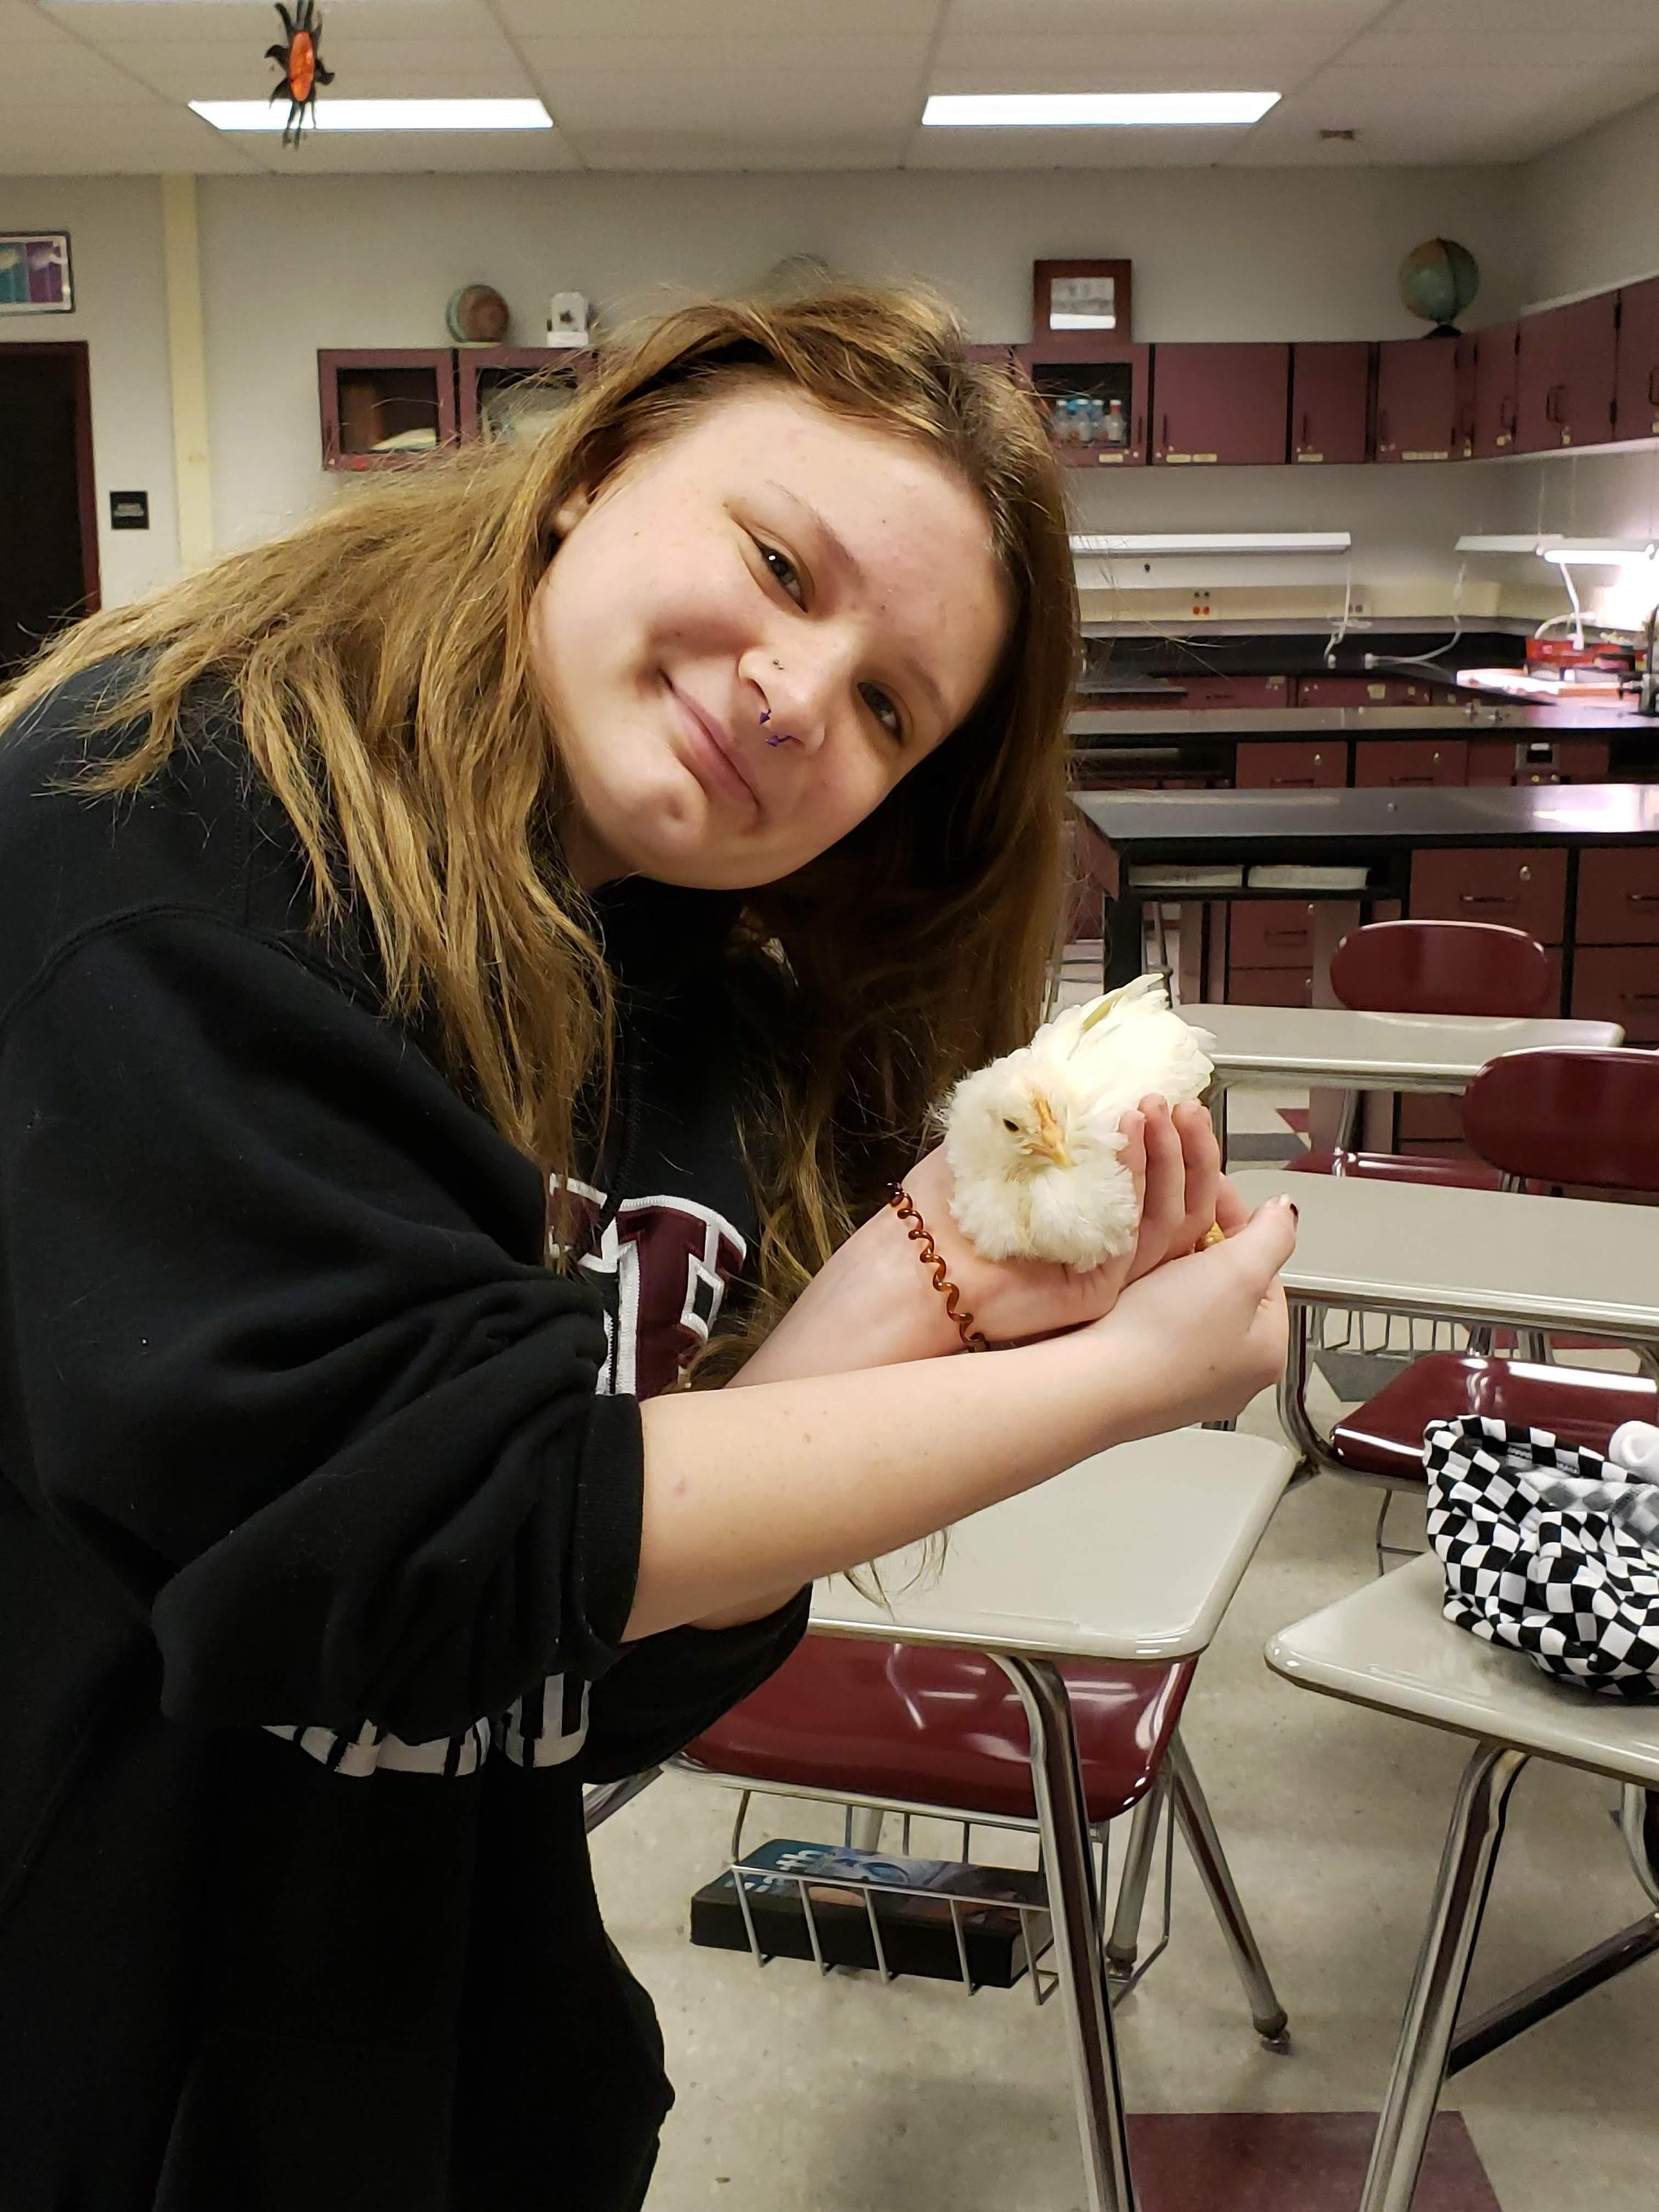 Makayla loves Harry the Chicken